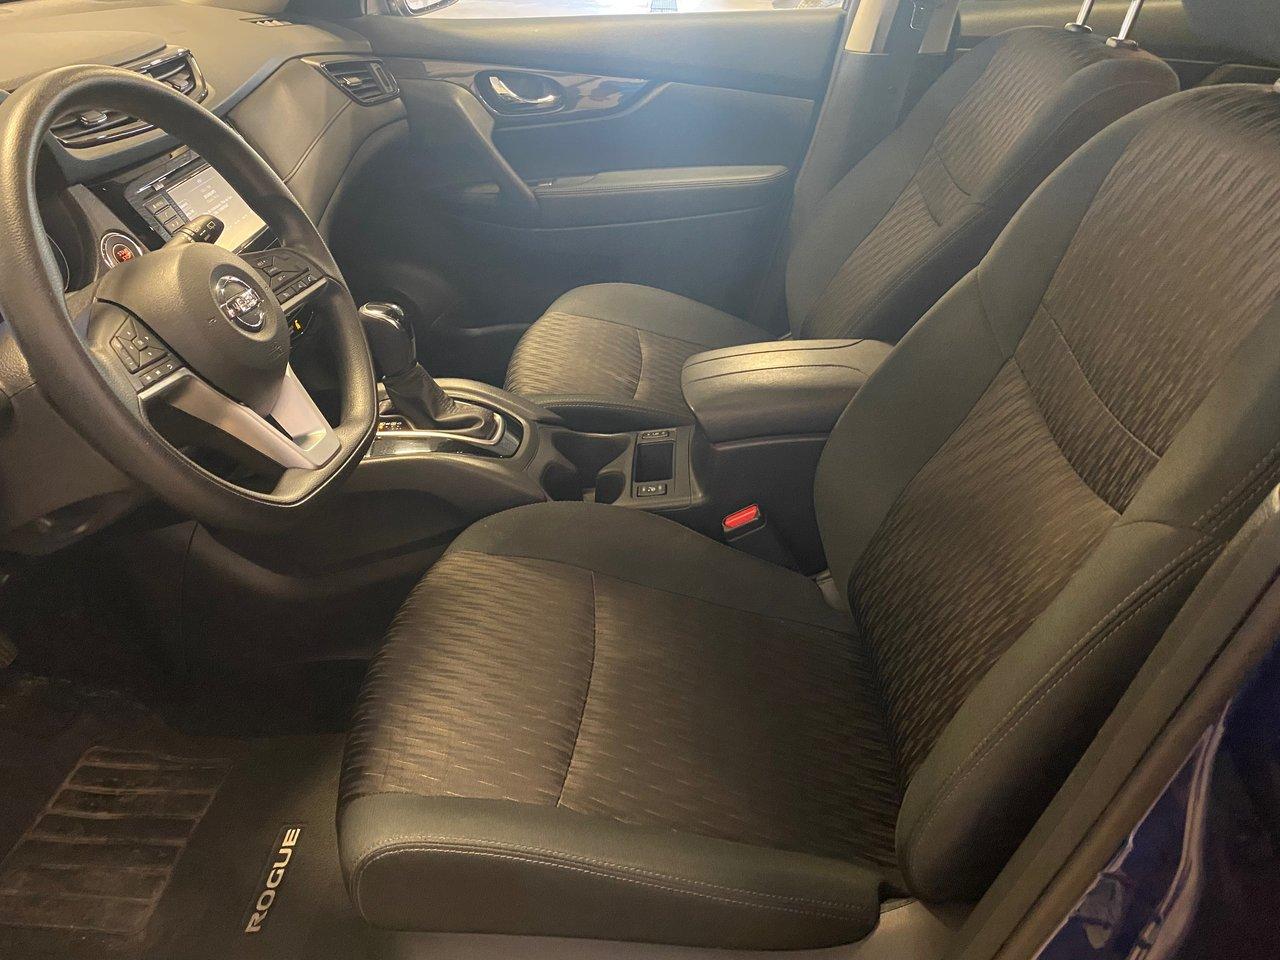 2018 Nissan Rogue SV AWD AWC 4WD JAMAIS ACCIDENTE